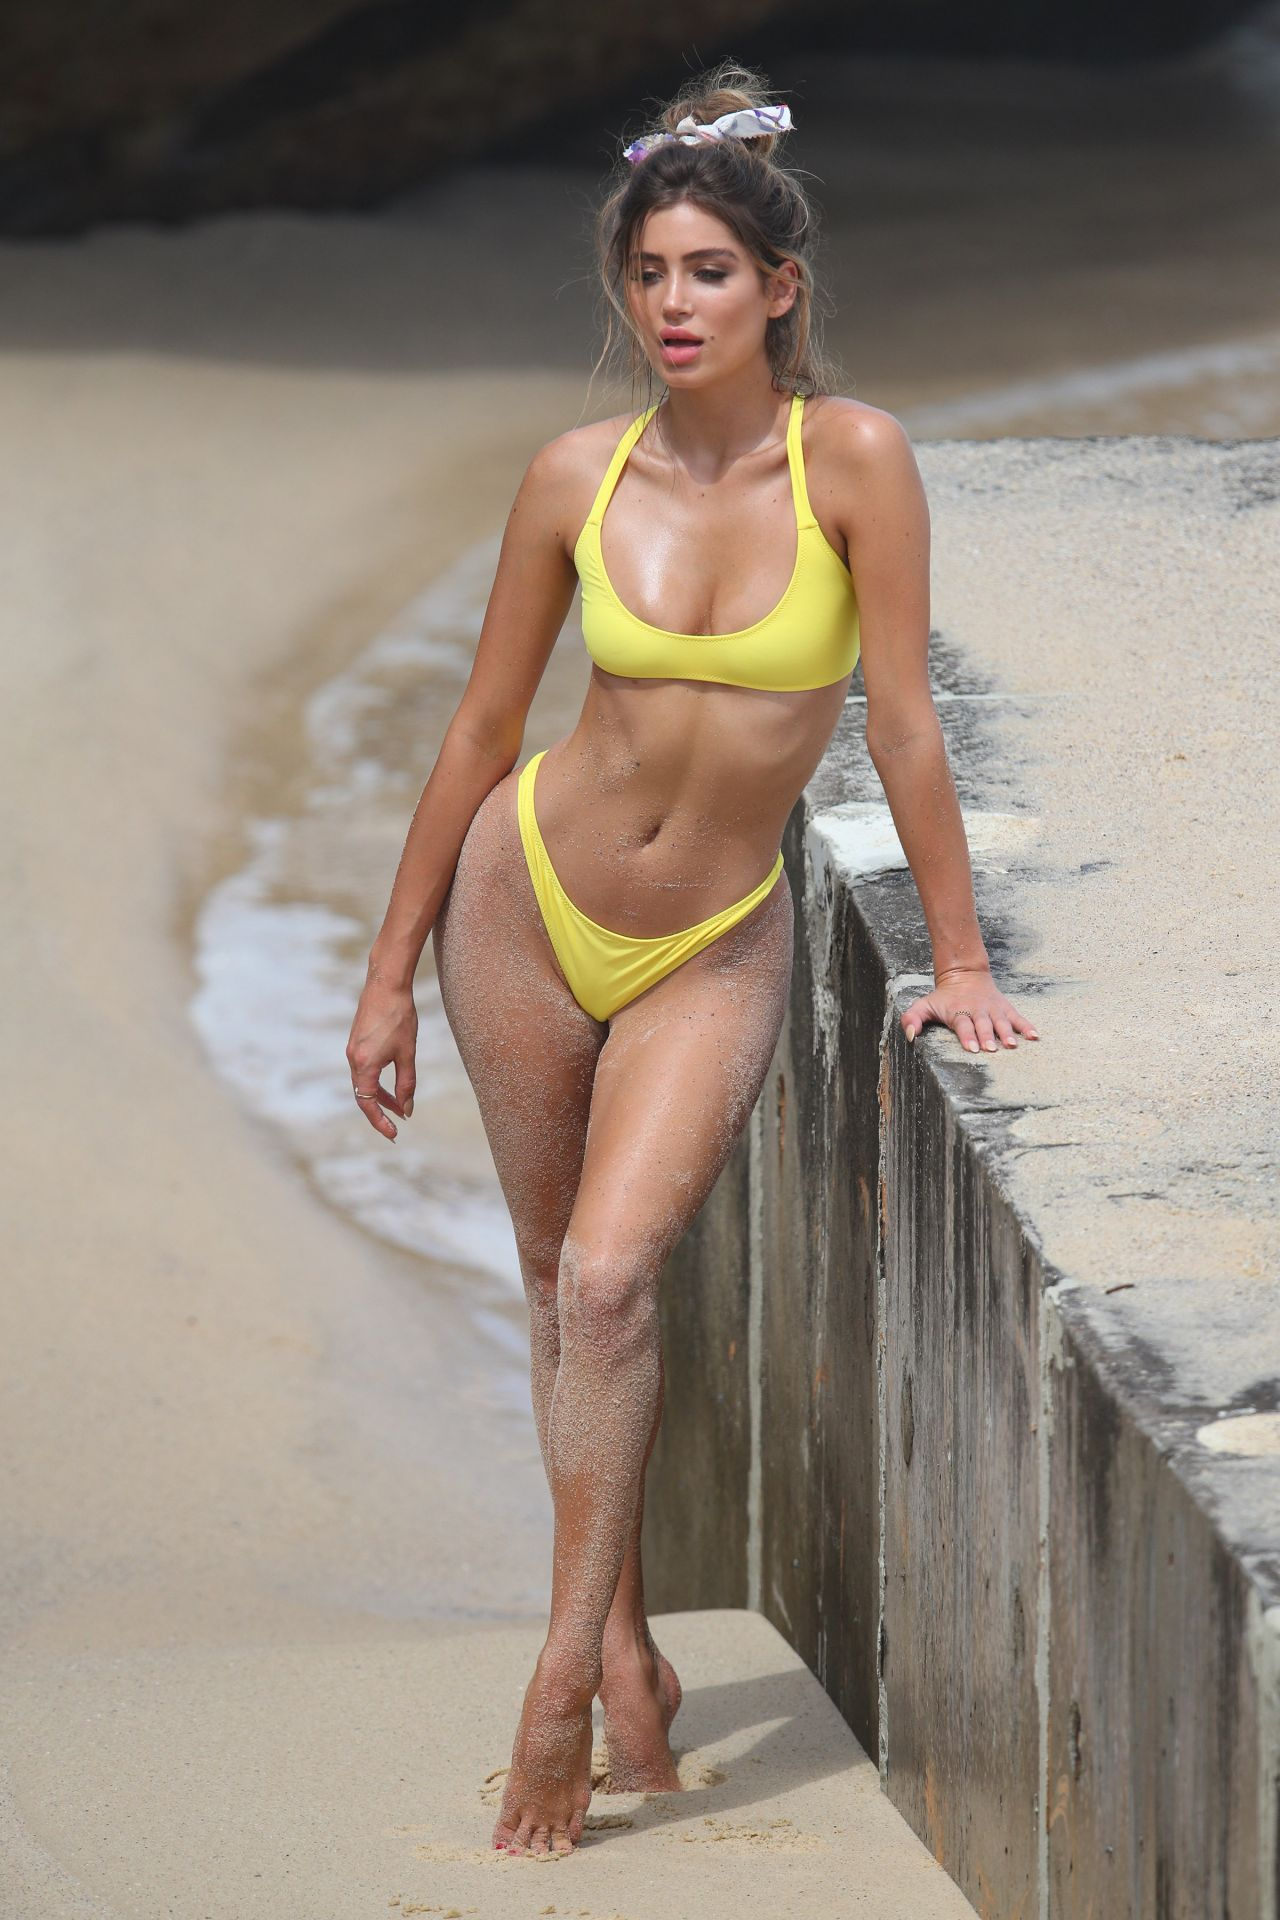 Bella Lucia Bikini Photoshoot on Bronte Beach Pics 4 of 35